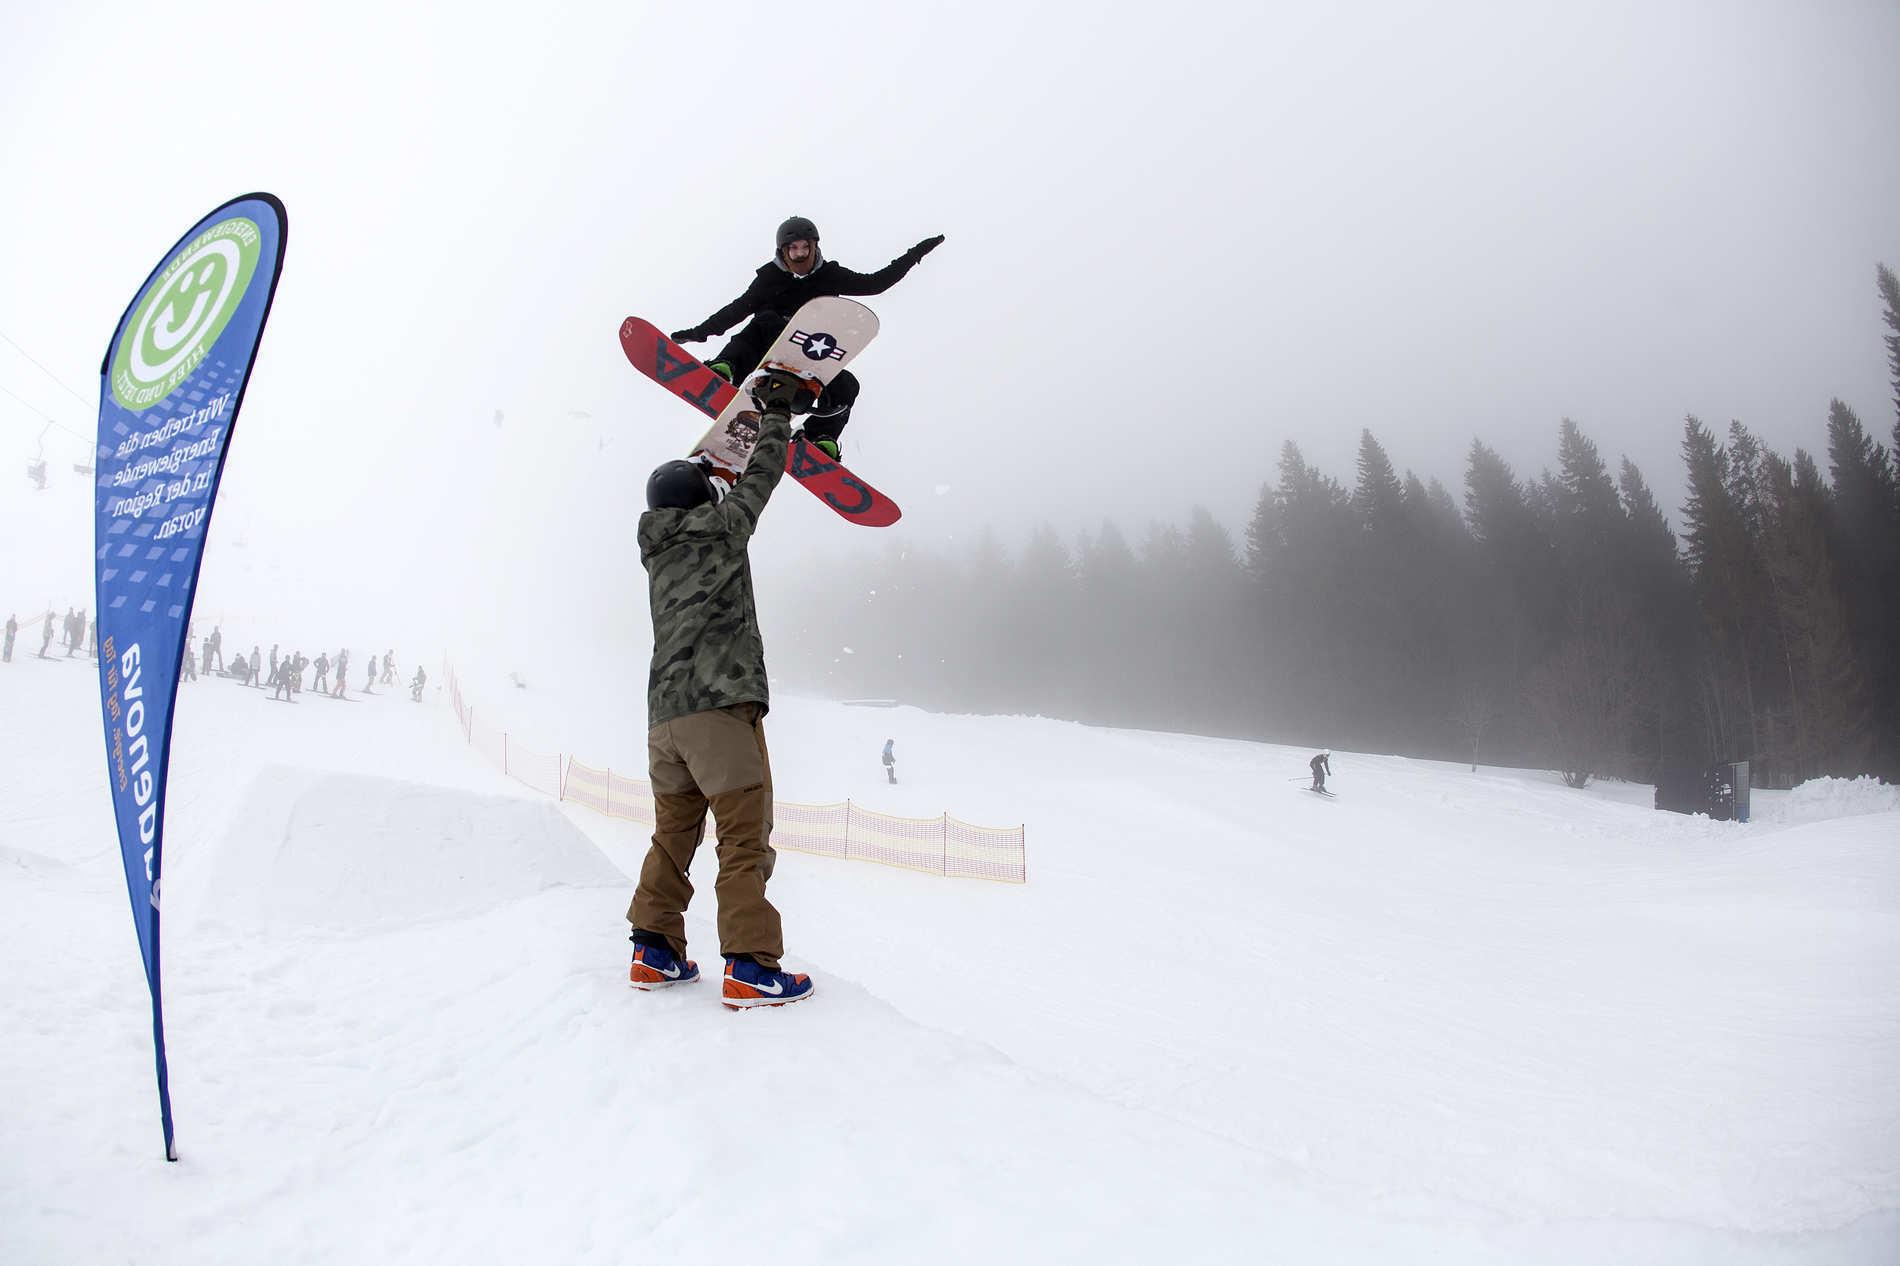 web snowpark feldberg 17 03 2018 action sb unknown martin herrmann qparks 15